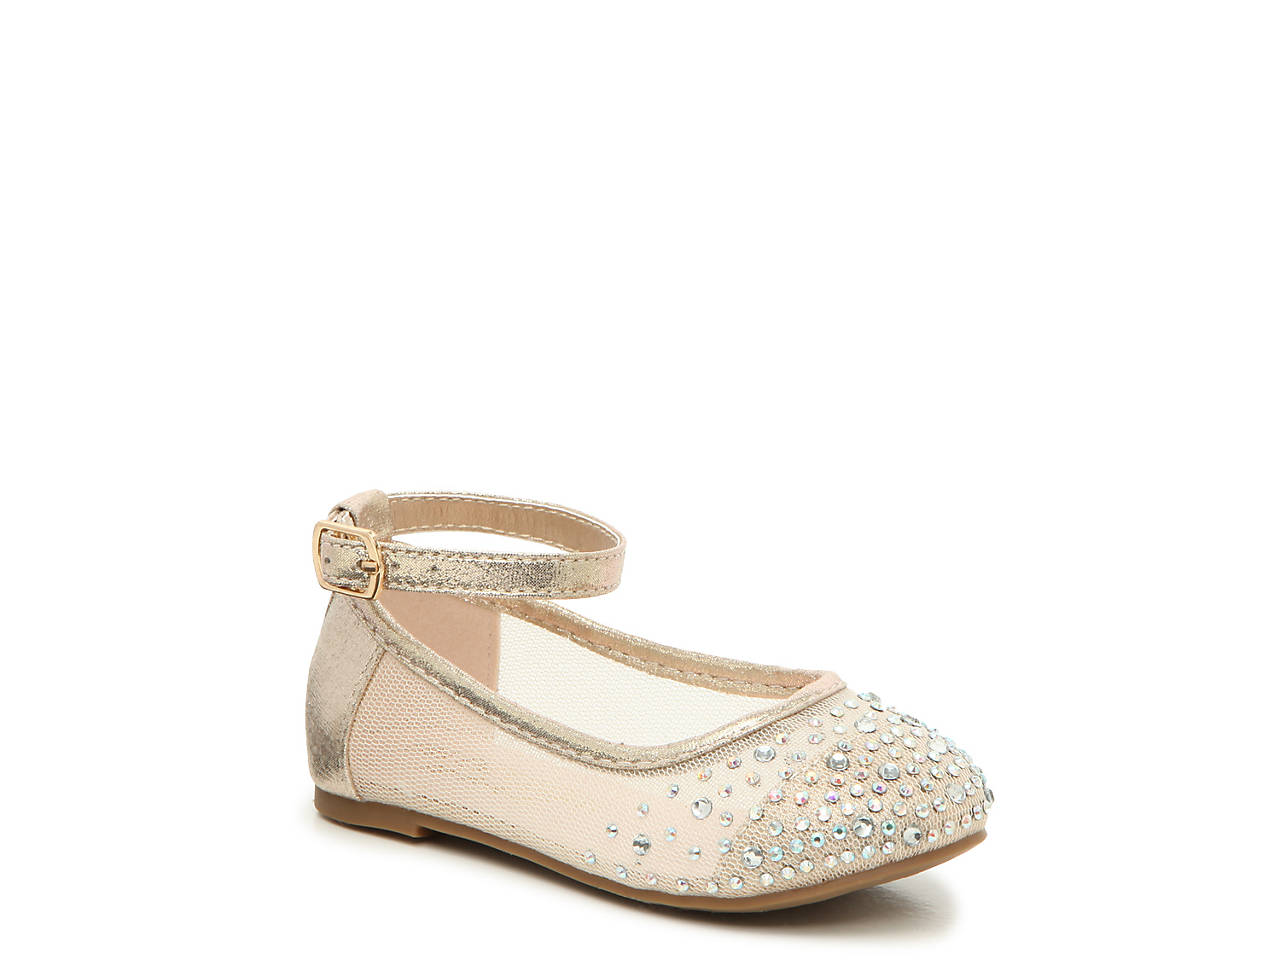 c68a2a17f1e De Blossom Harper Infant   Toddler Flat Kids Shoes